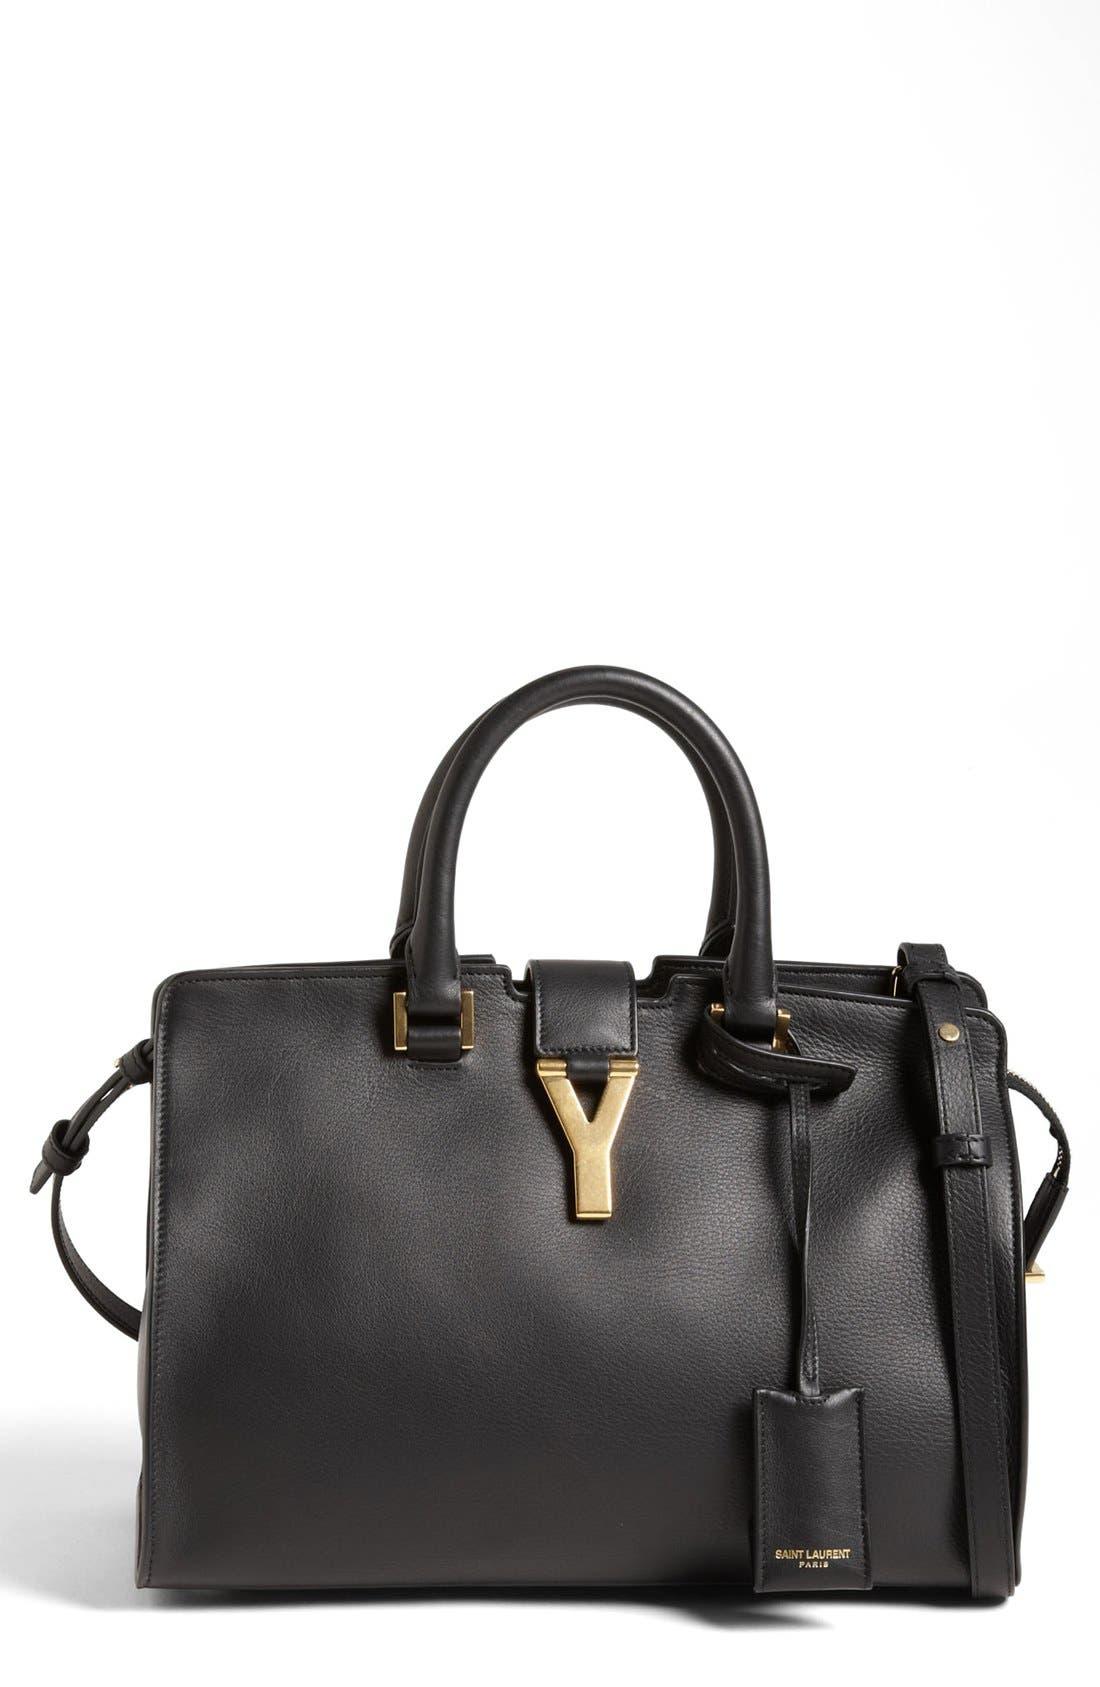 Alternate Image 1 Selected - Saint Laurent 'Petite Ligne Y' Leather Tote